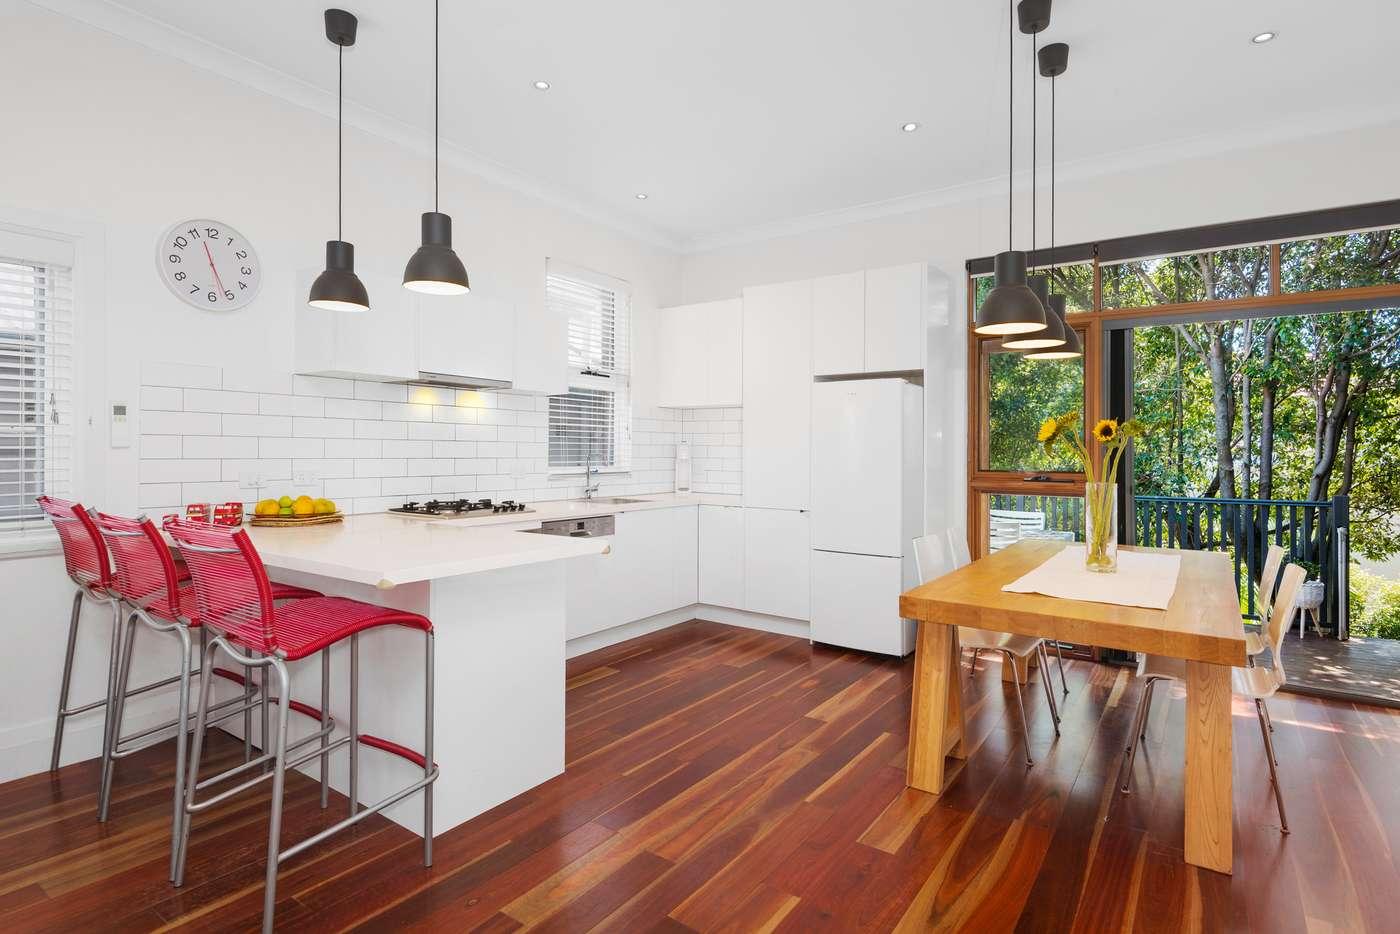 Main view of Homely apartment listing, 3/53 Sir Thomas Mitchell Road, Bondi Beach NSW 2026